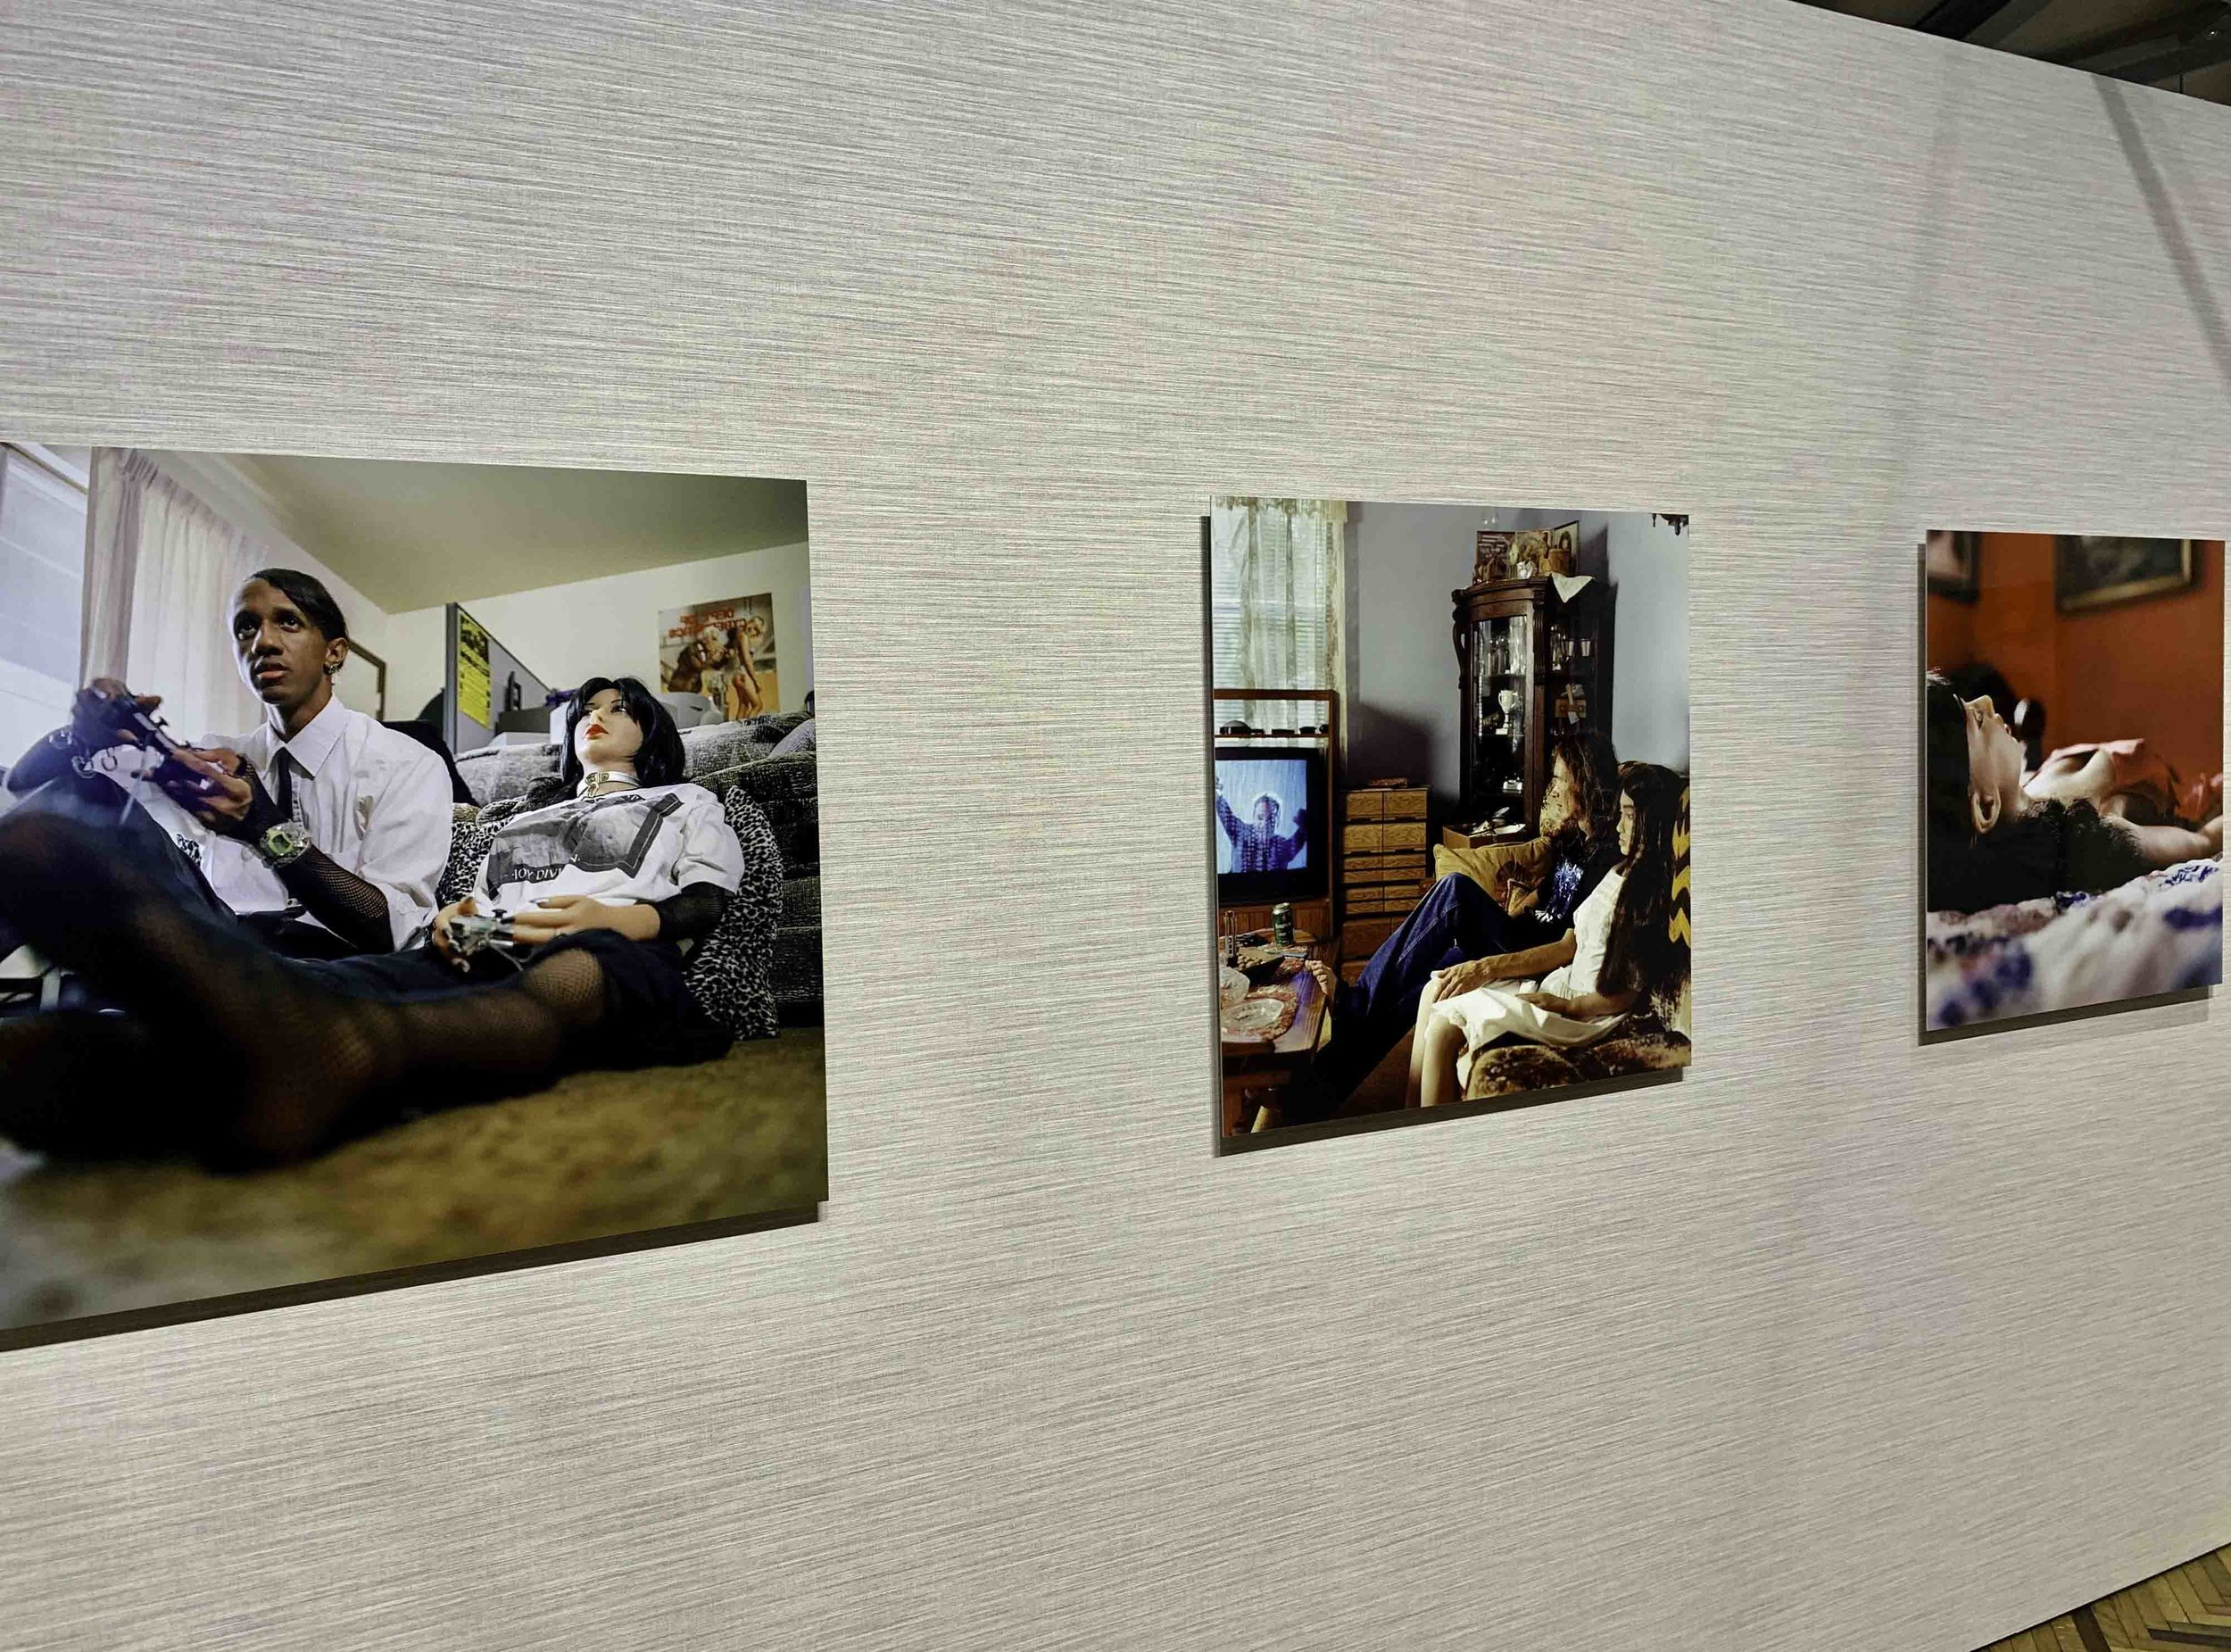 Surrogati. Un Amore Ideale At Prada Fondazione (9 - 29).jpg